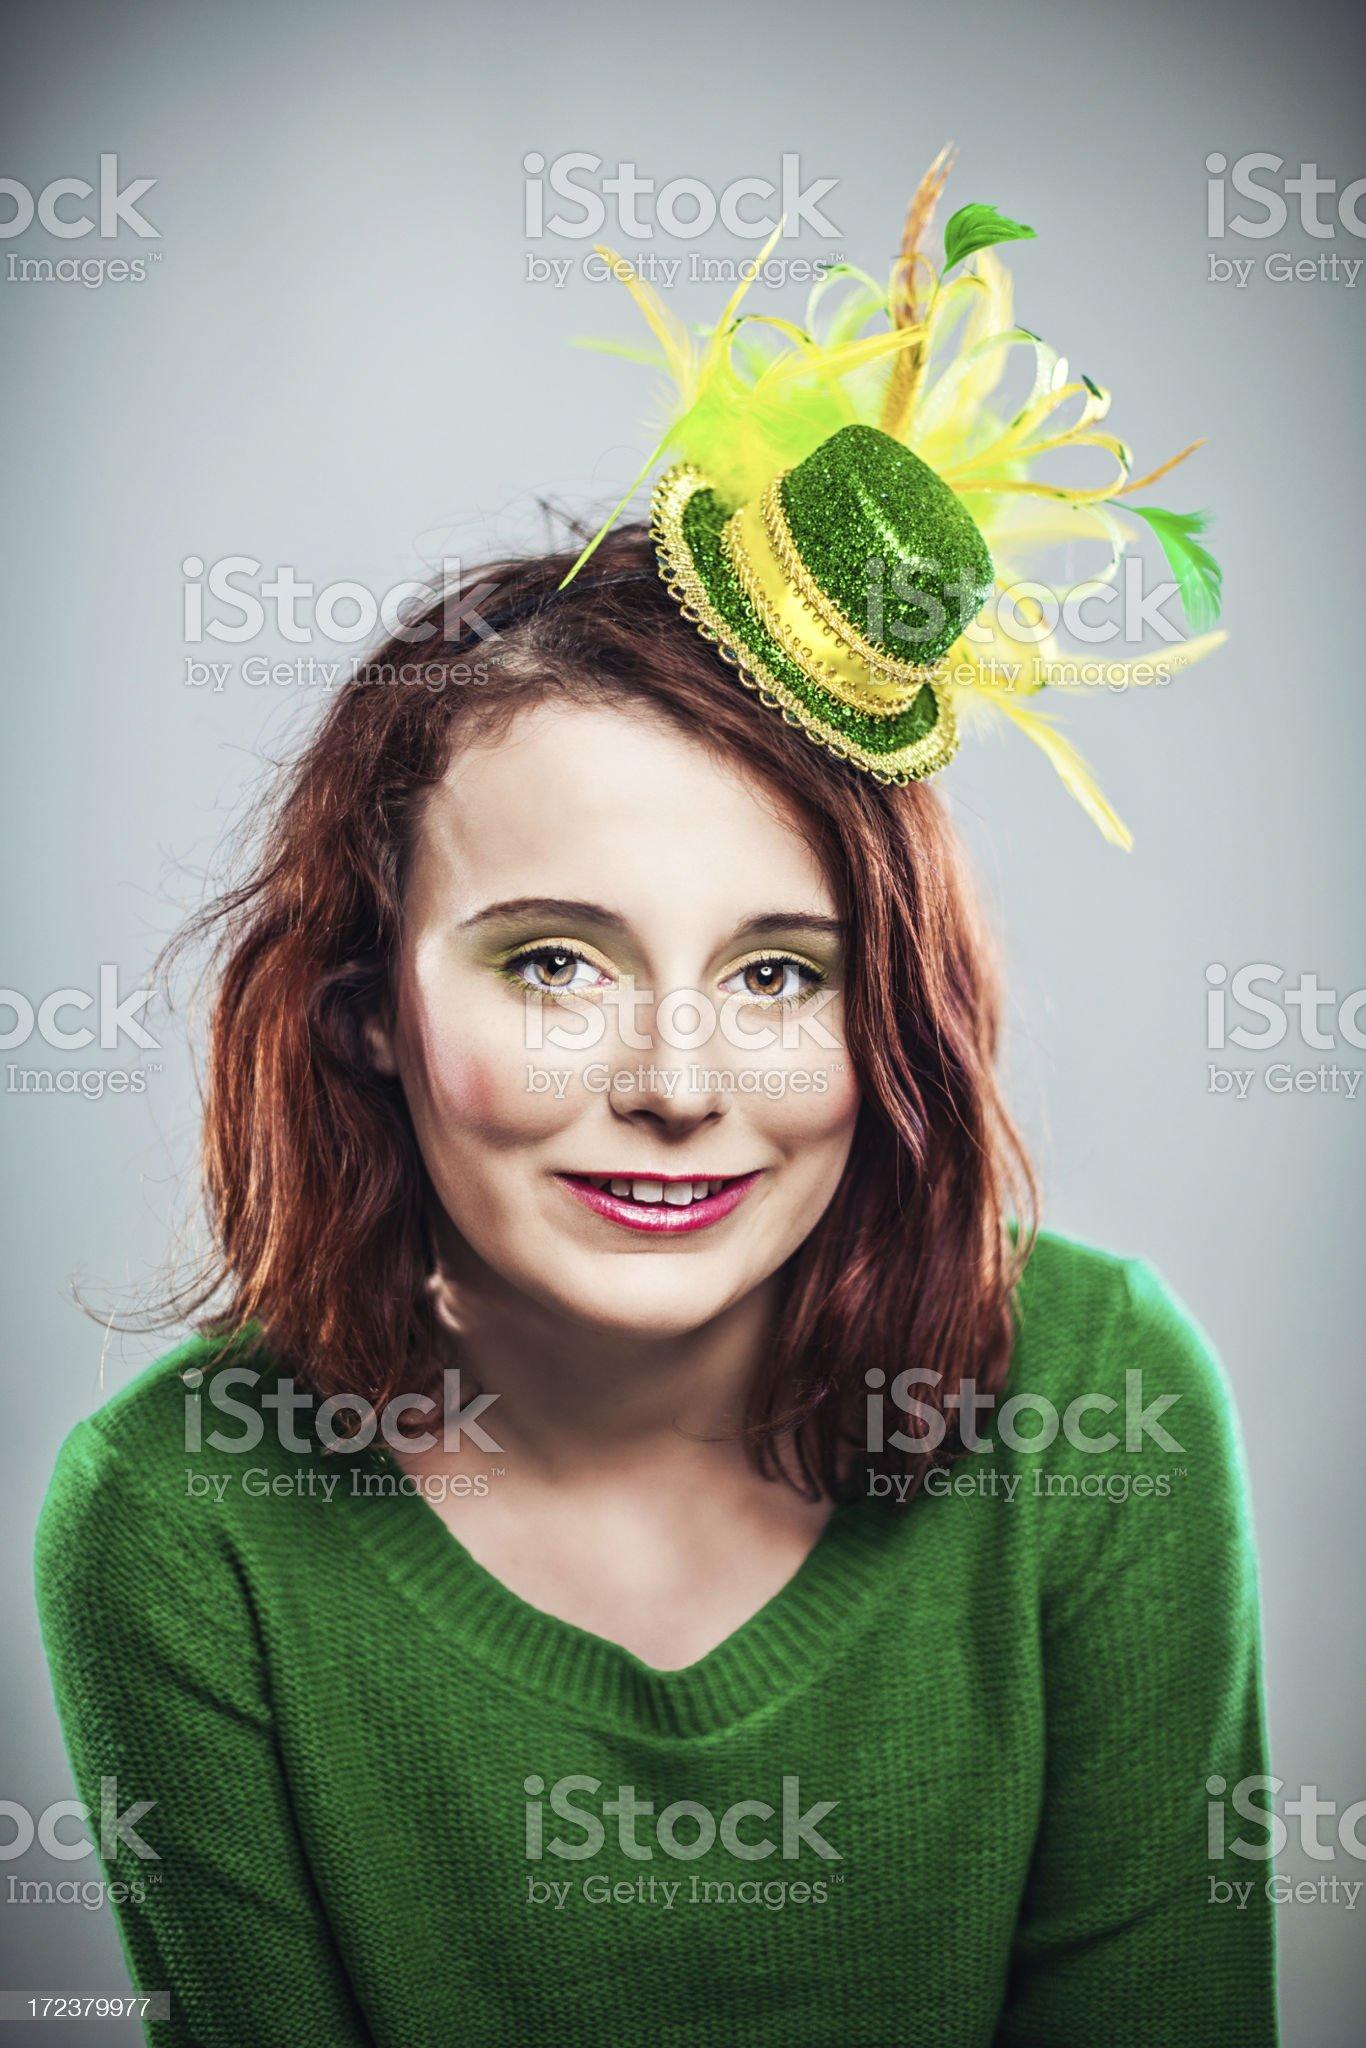 Irish girl ready for st patricks day royalty-free stock photo